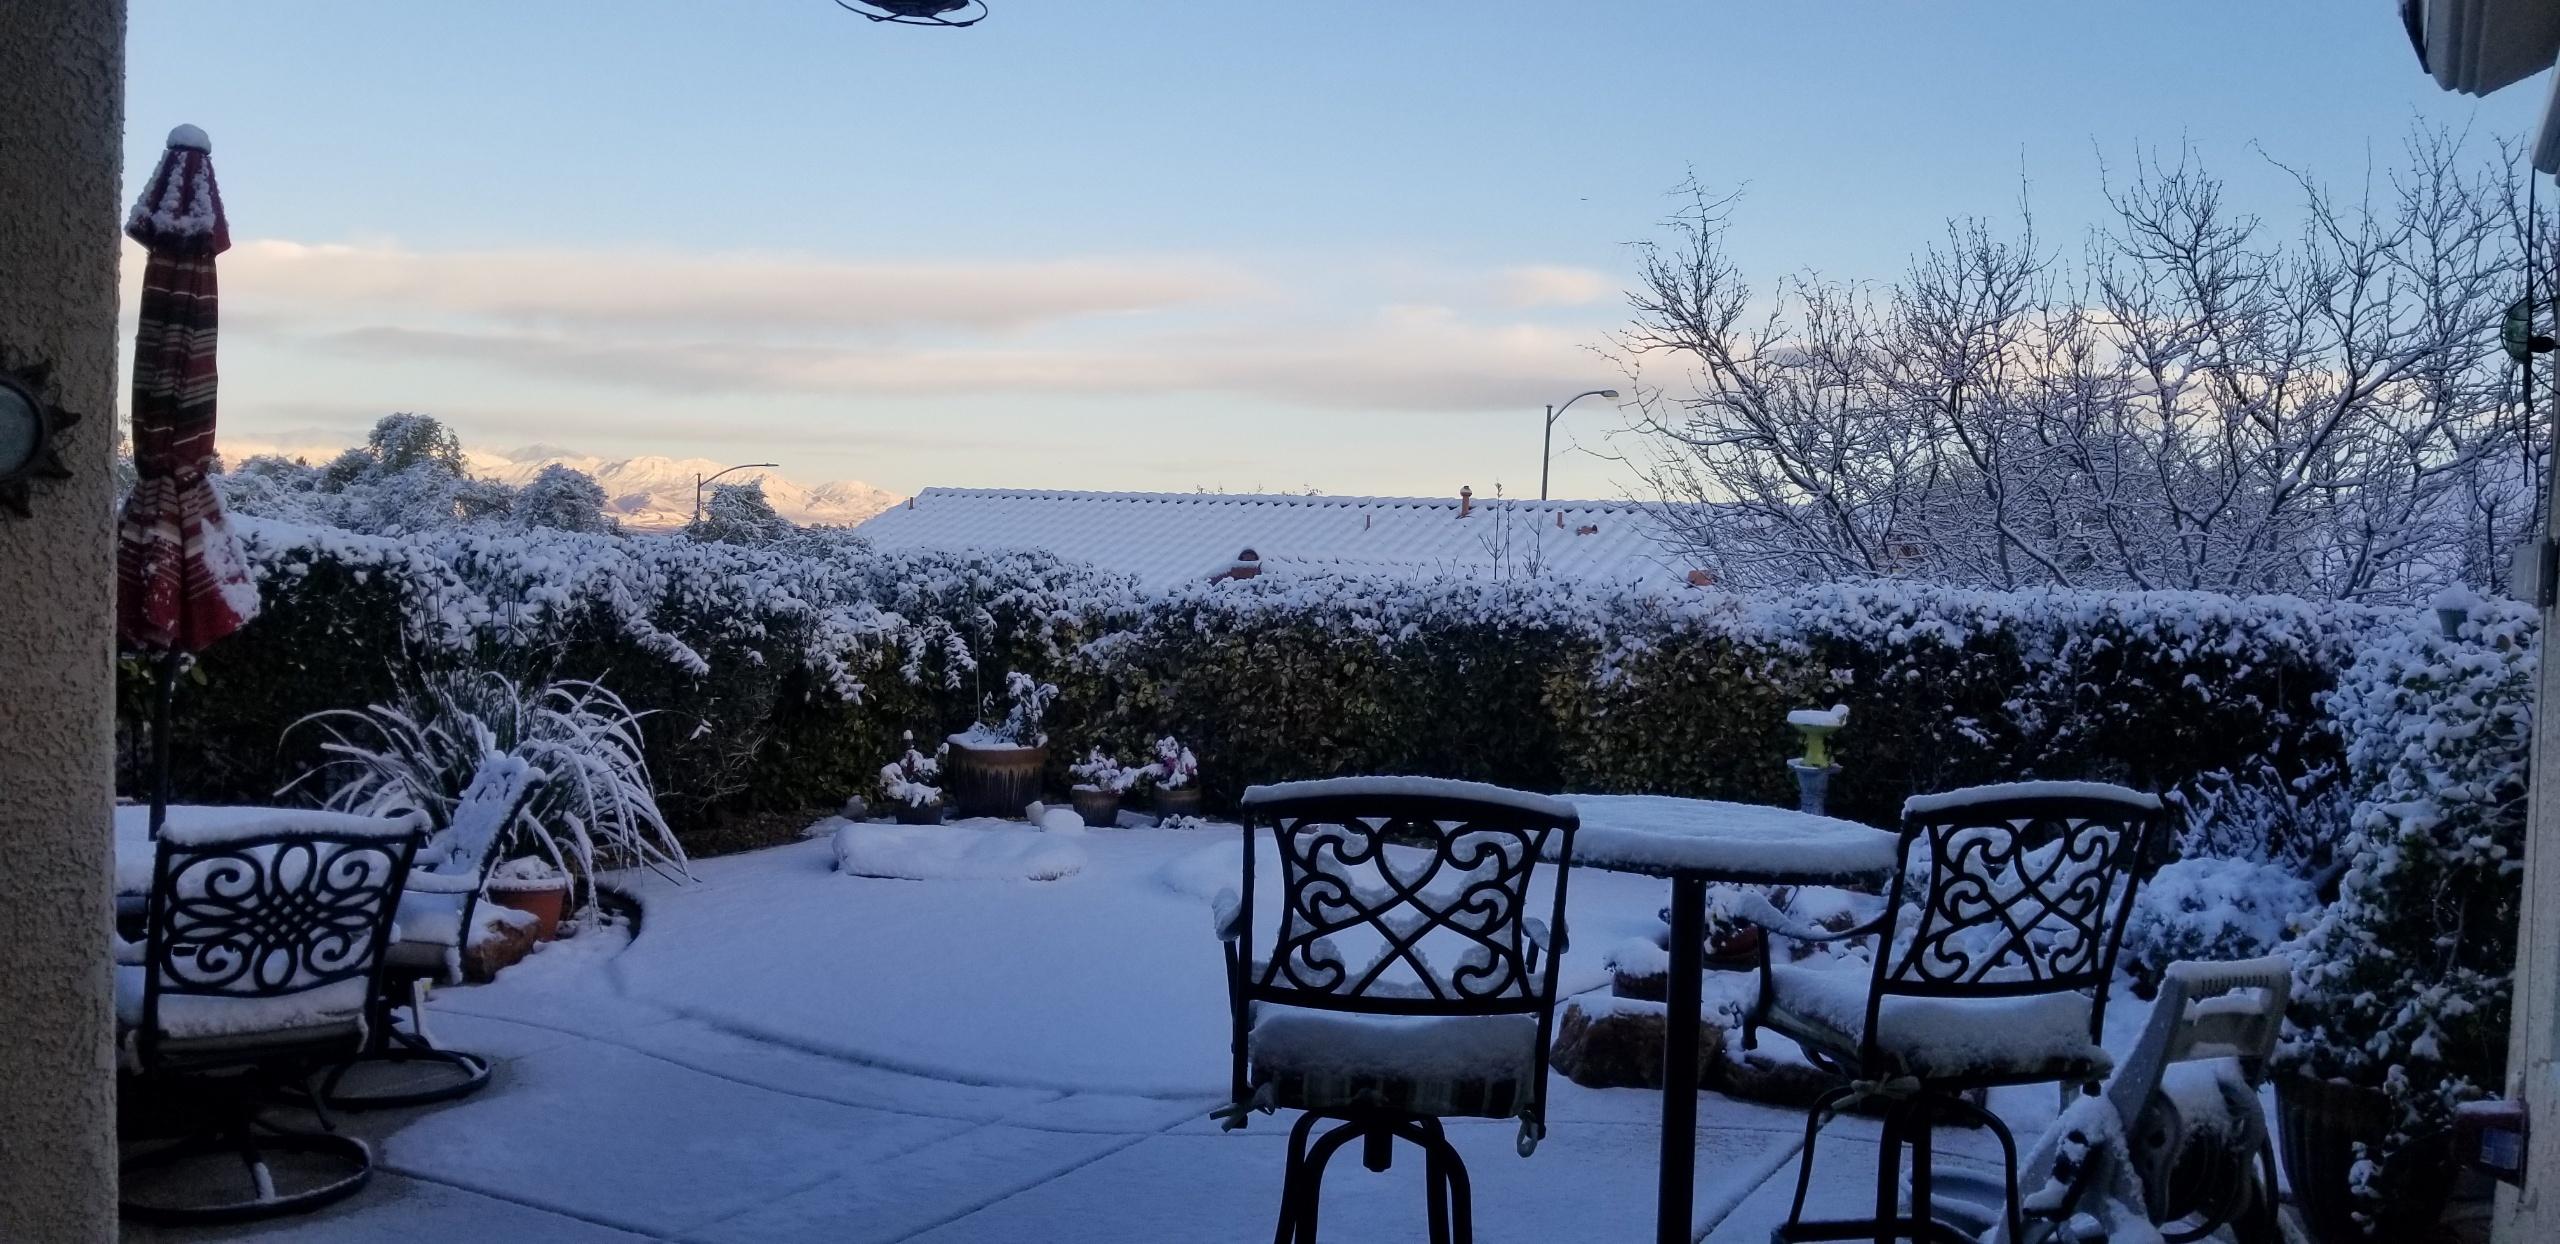 Snow_sun_city_anthem_Janis_Rounds_1550504773796.jpg